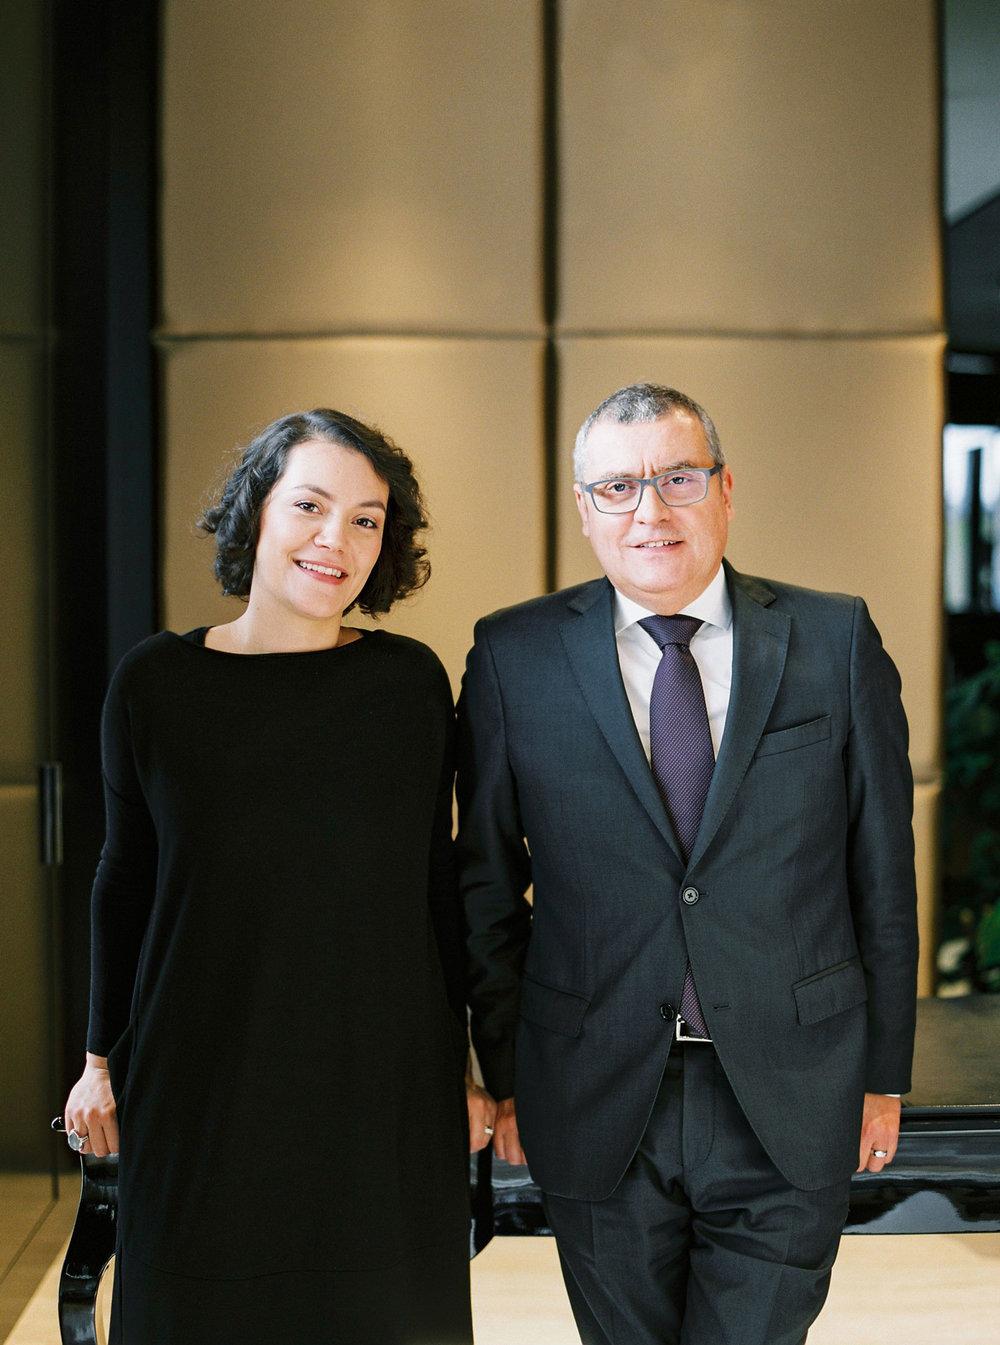 Diana Vieira, Creative Director and José Manuel Silva, Monseo CEO Portrait by André Teixeira